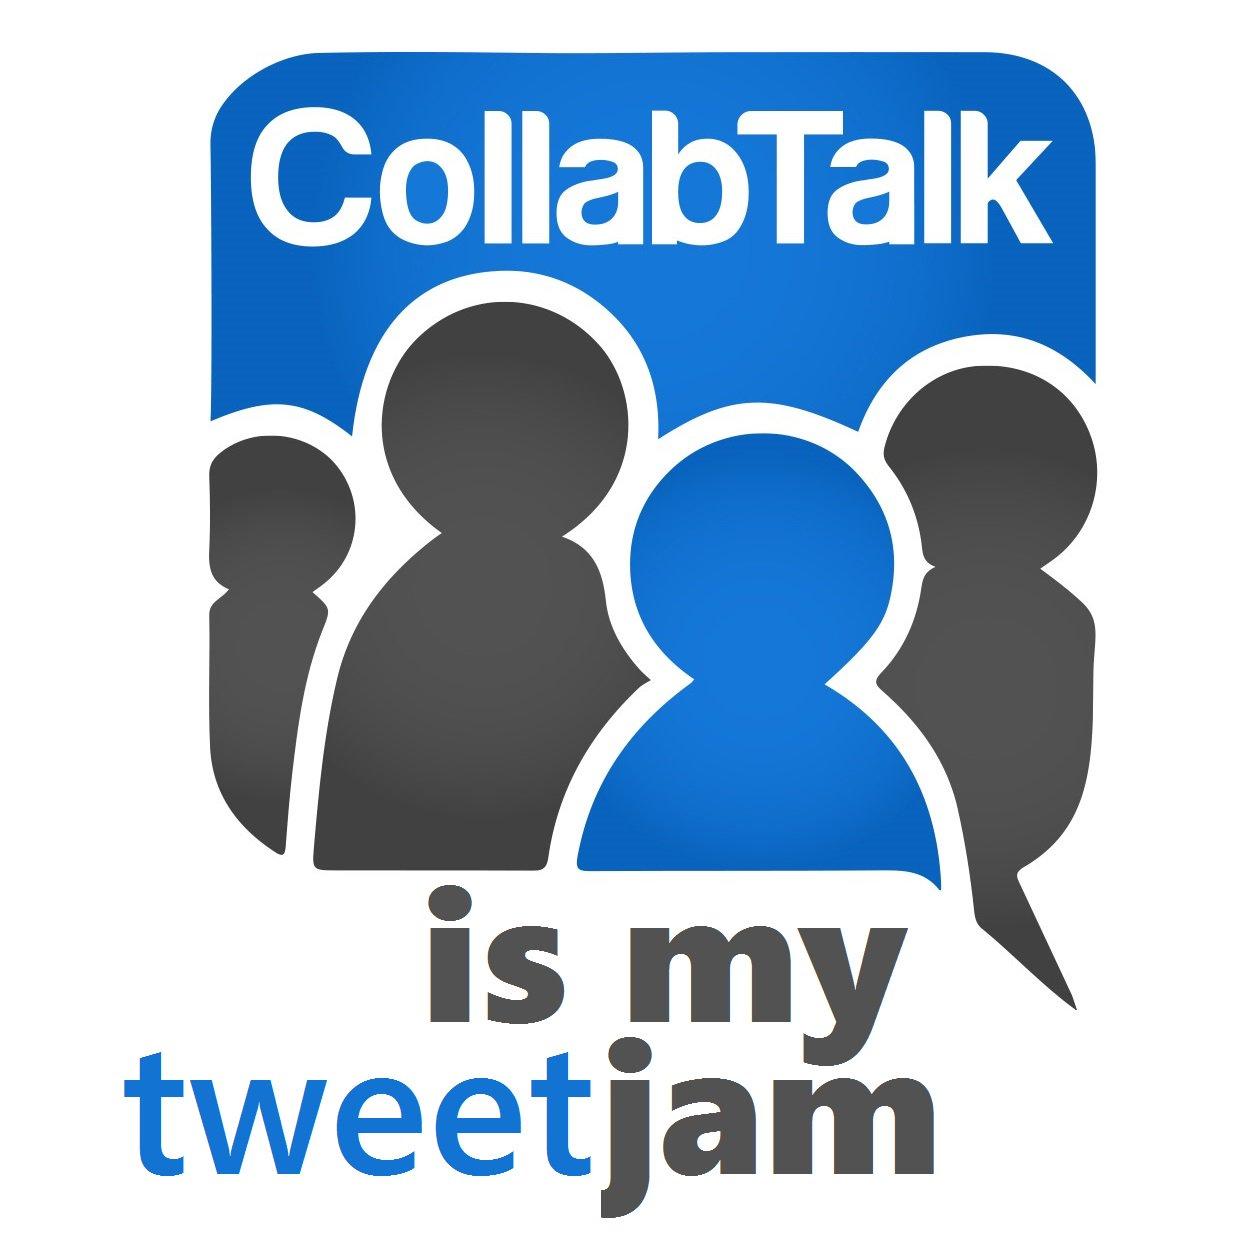 Thanks again to @AvePoint_Inc & @tyGraphTweets for sponsoring tomorrow's #CollabTalk tweetjam! https://t.co/bFmpnHf1Cm #Hybrid #SharePoint https://t.co/lGCv0OWWL3